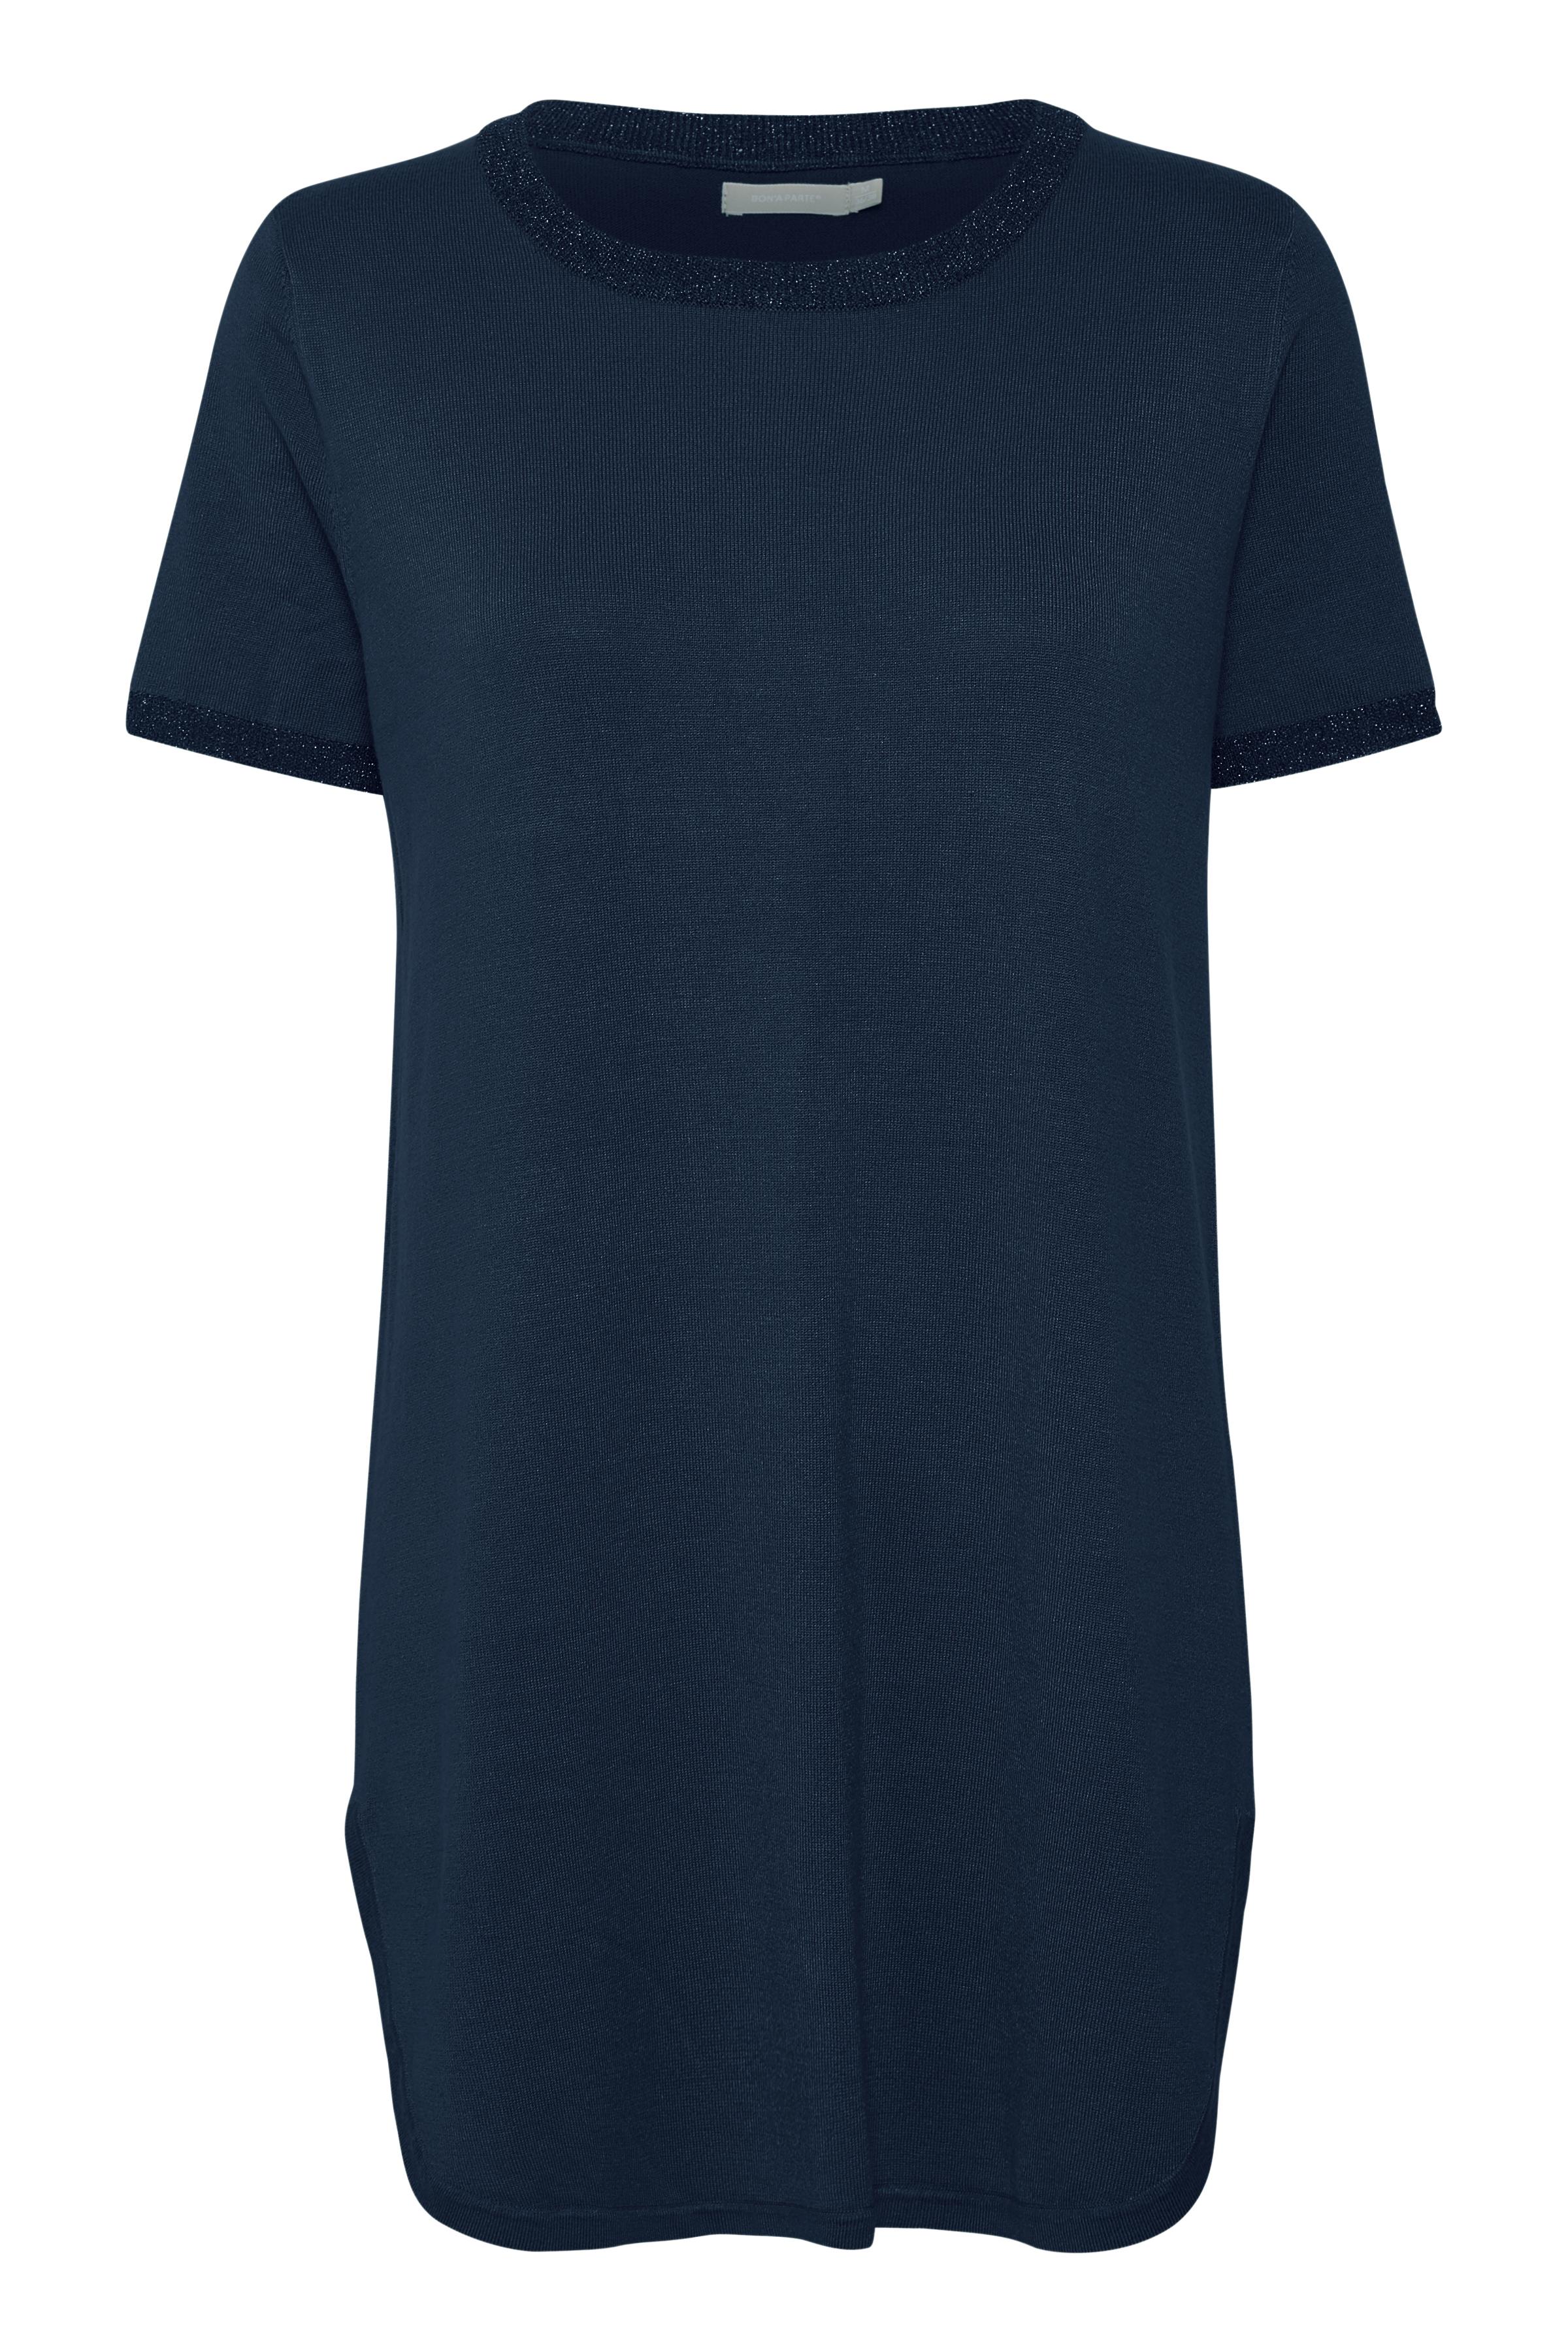 Marinblå Stickad tunika från Bon'A Parte – Köp Marinblå Stickad tunika från stl. S-2XL här